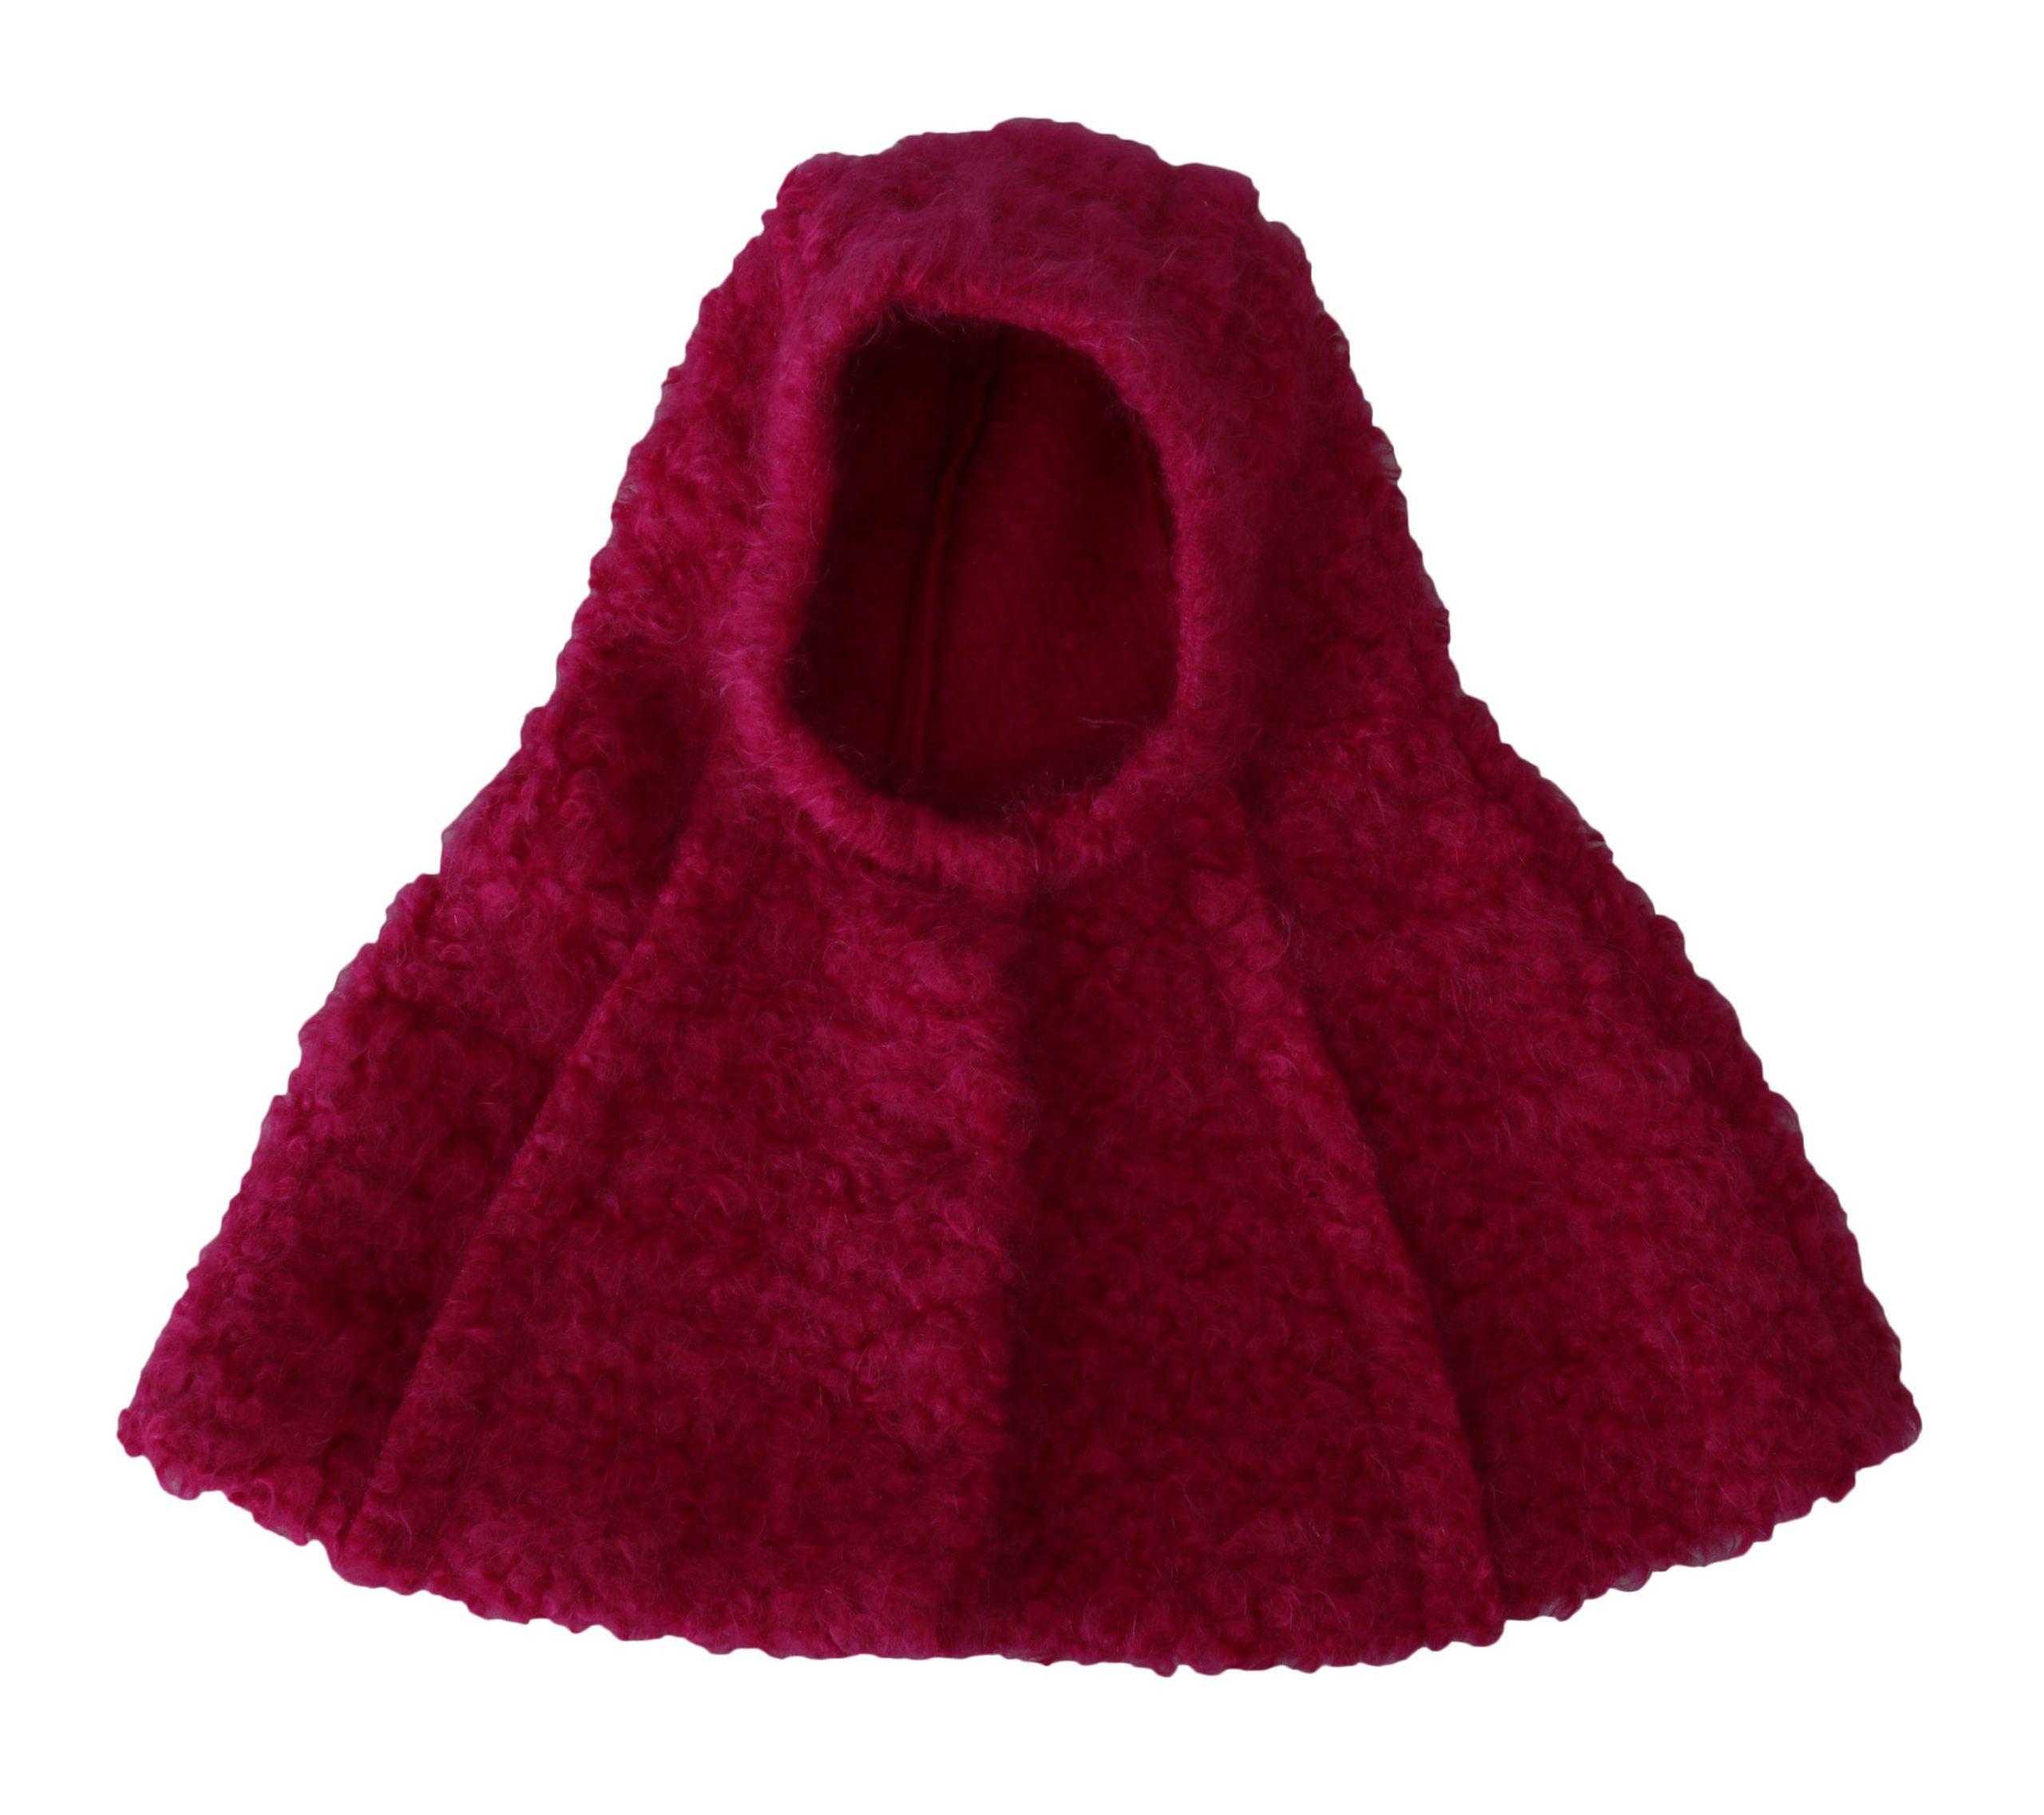 Dolce & Gabbana Women's Mohair Shearling Wool Hooded Hat Pink TSH4232 - 57 cm|S